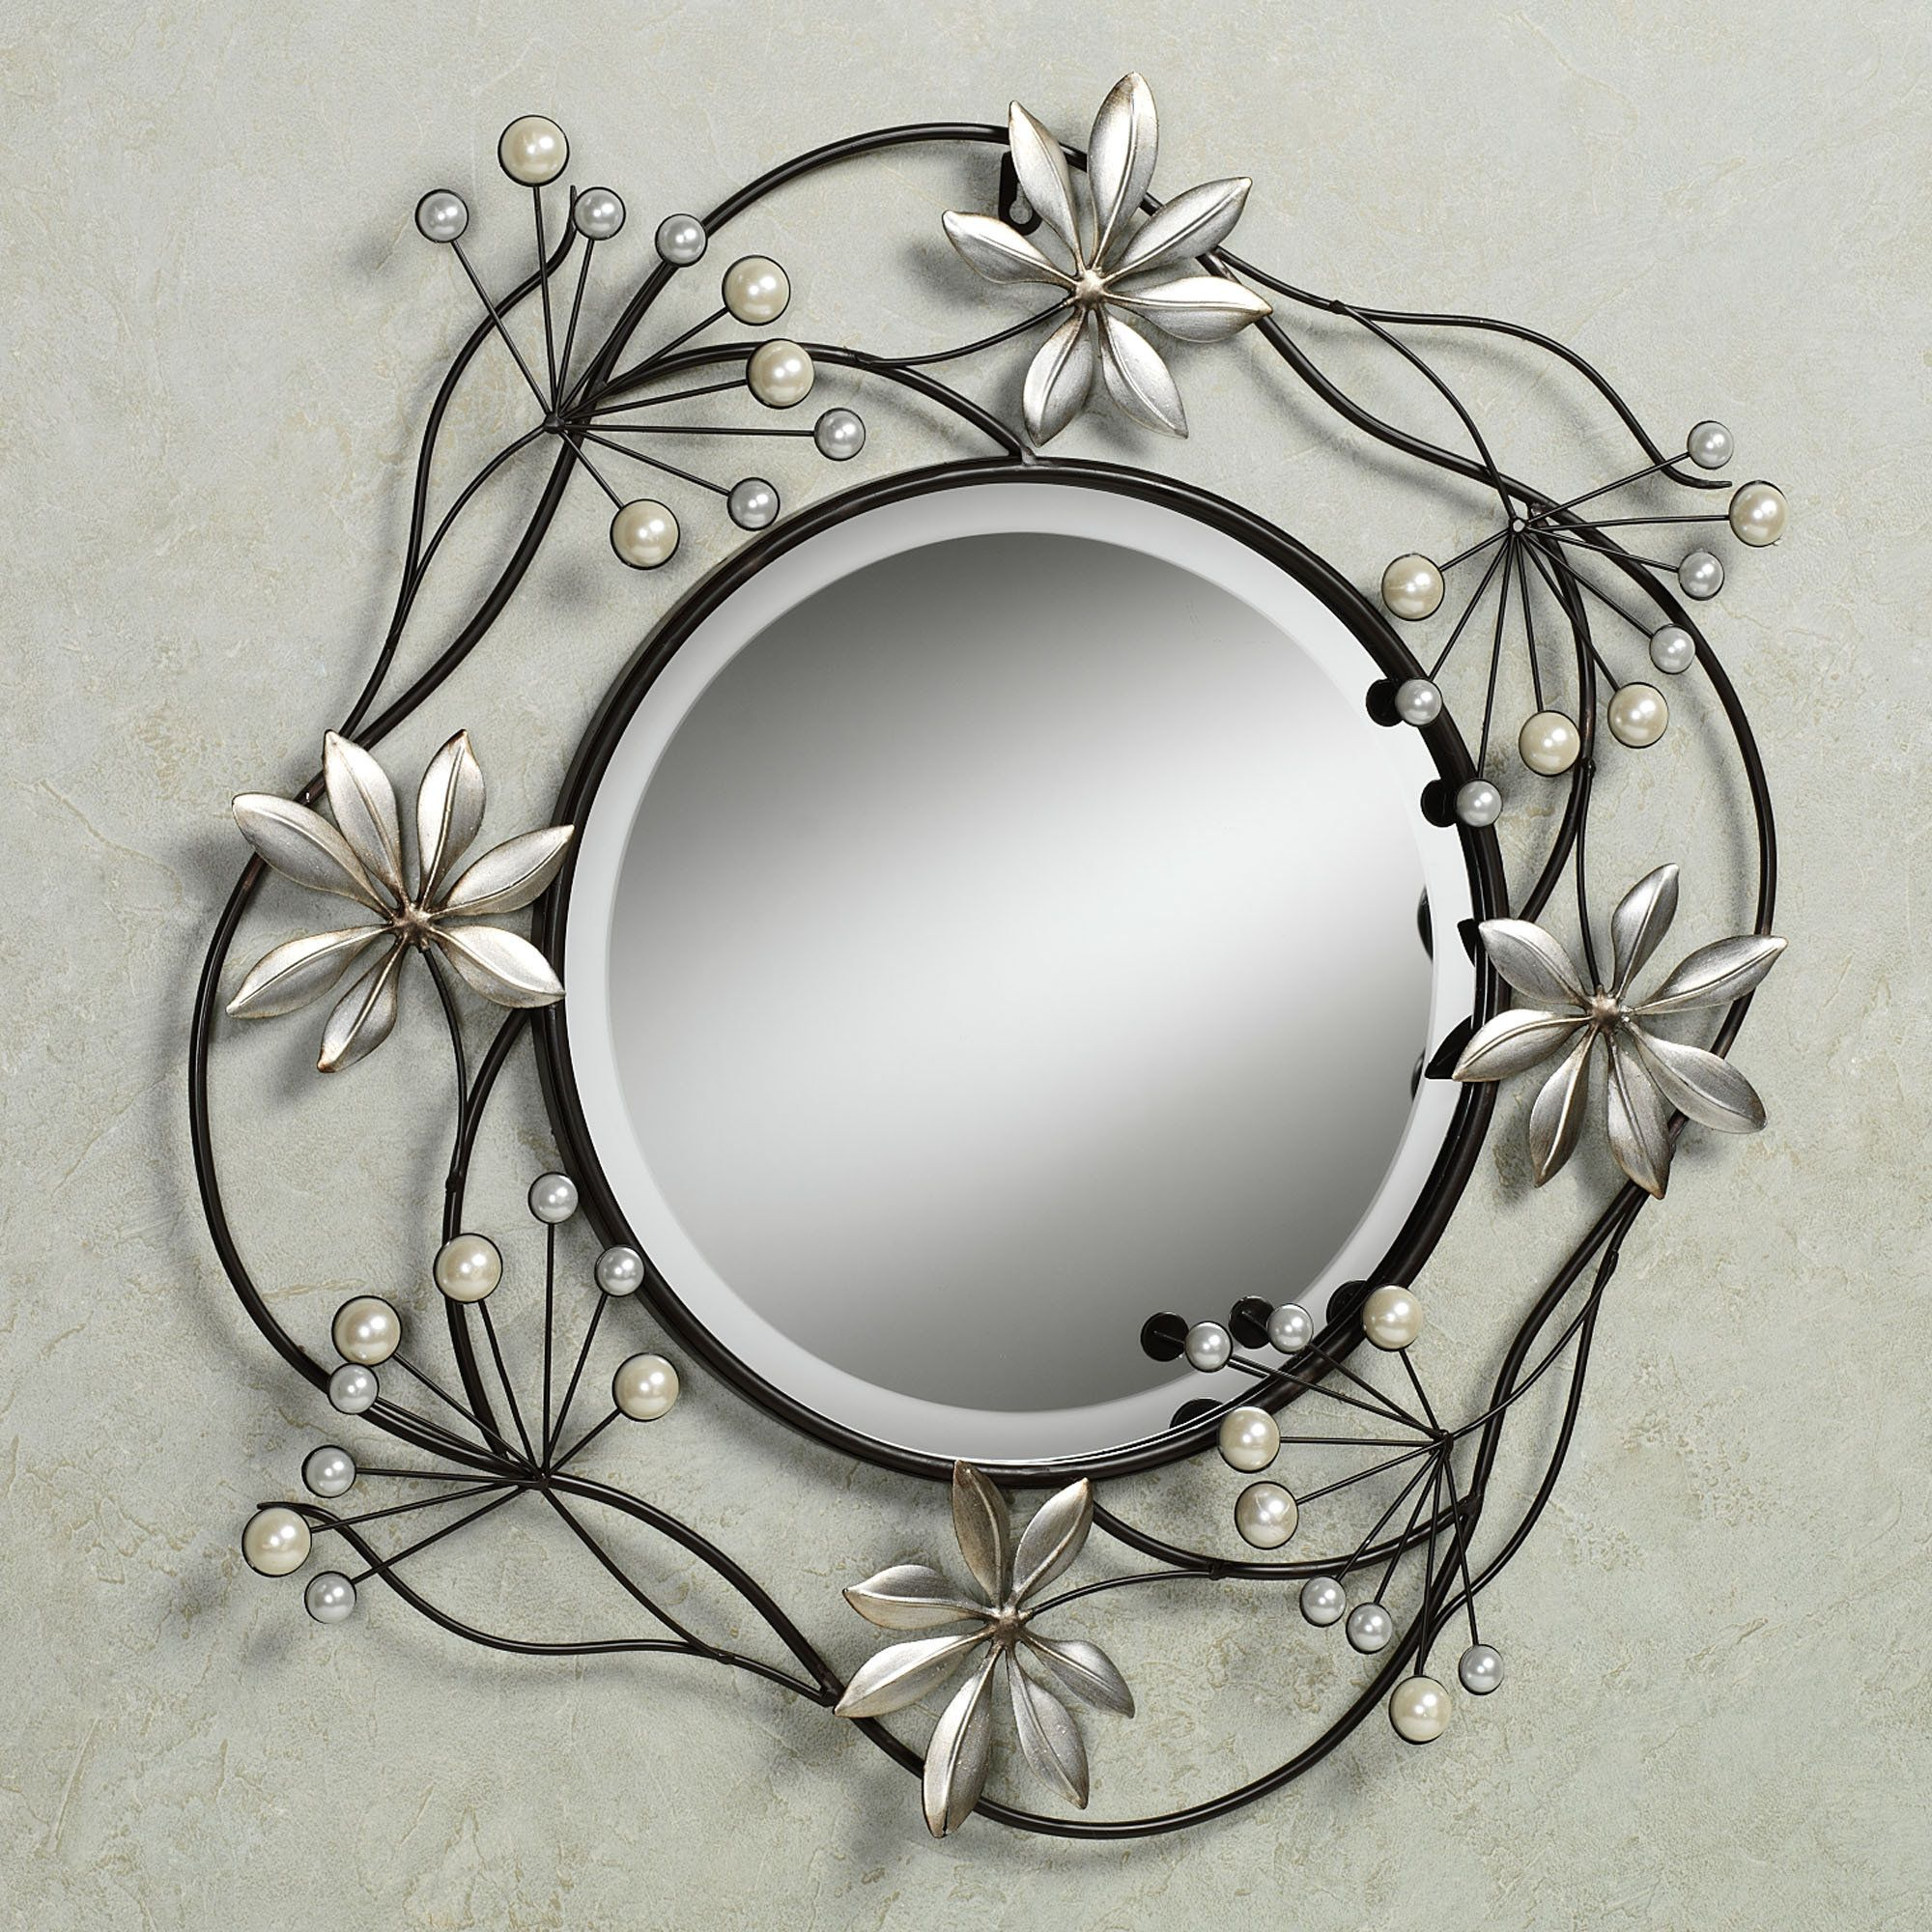 Pearl array round metal wall mirror outdoor decor pinterest